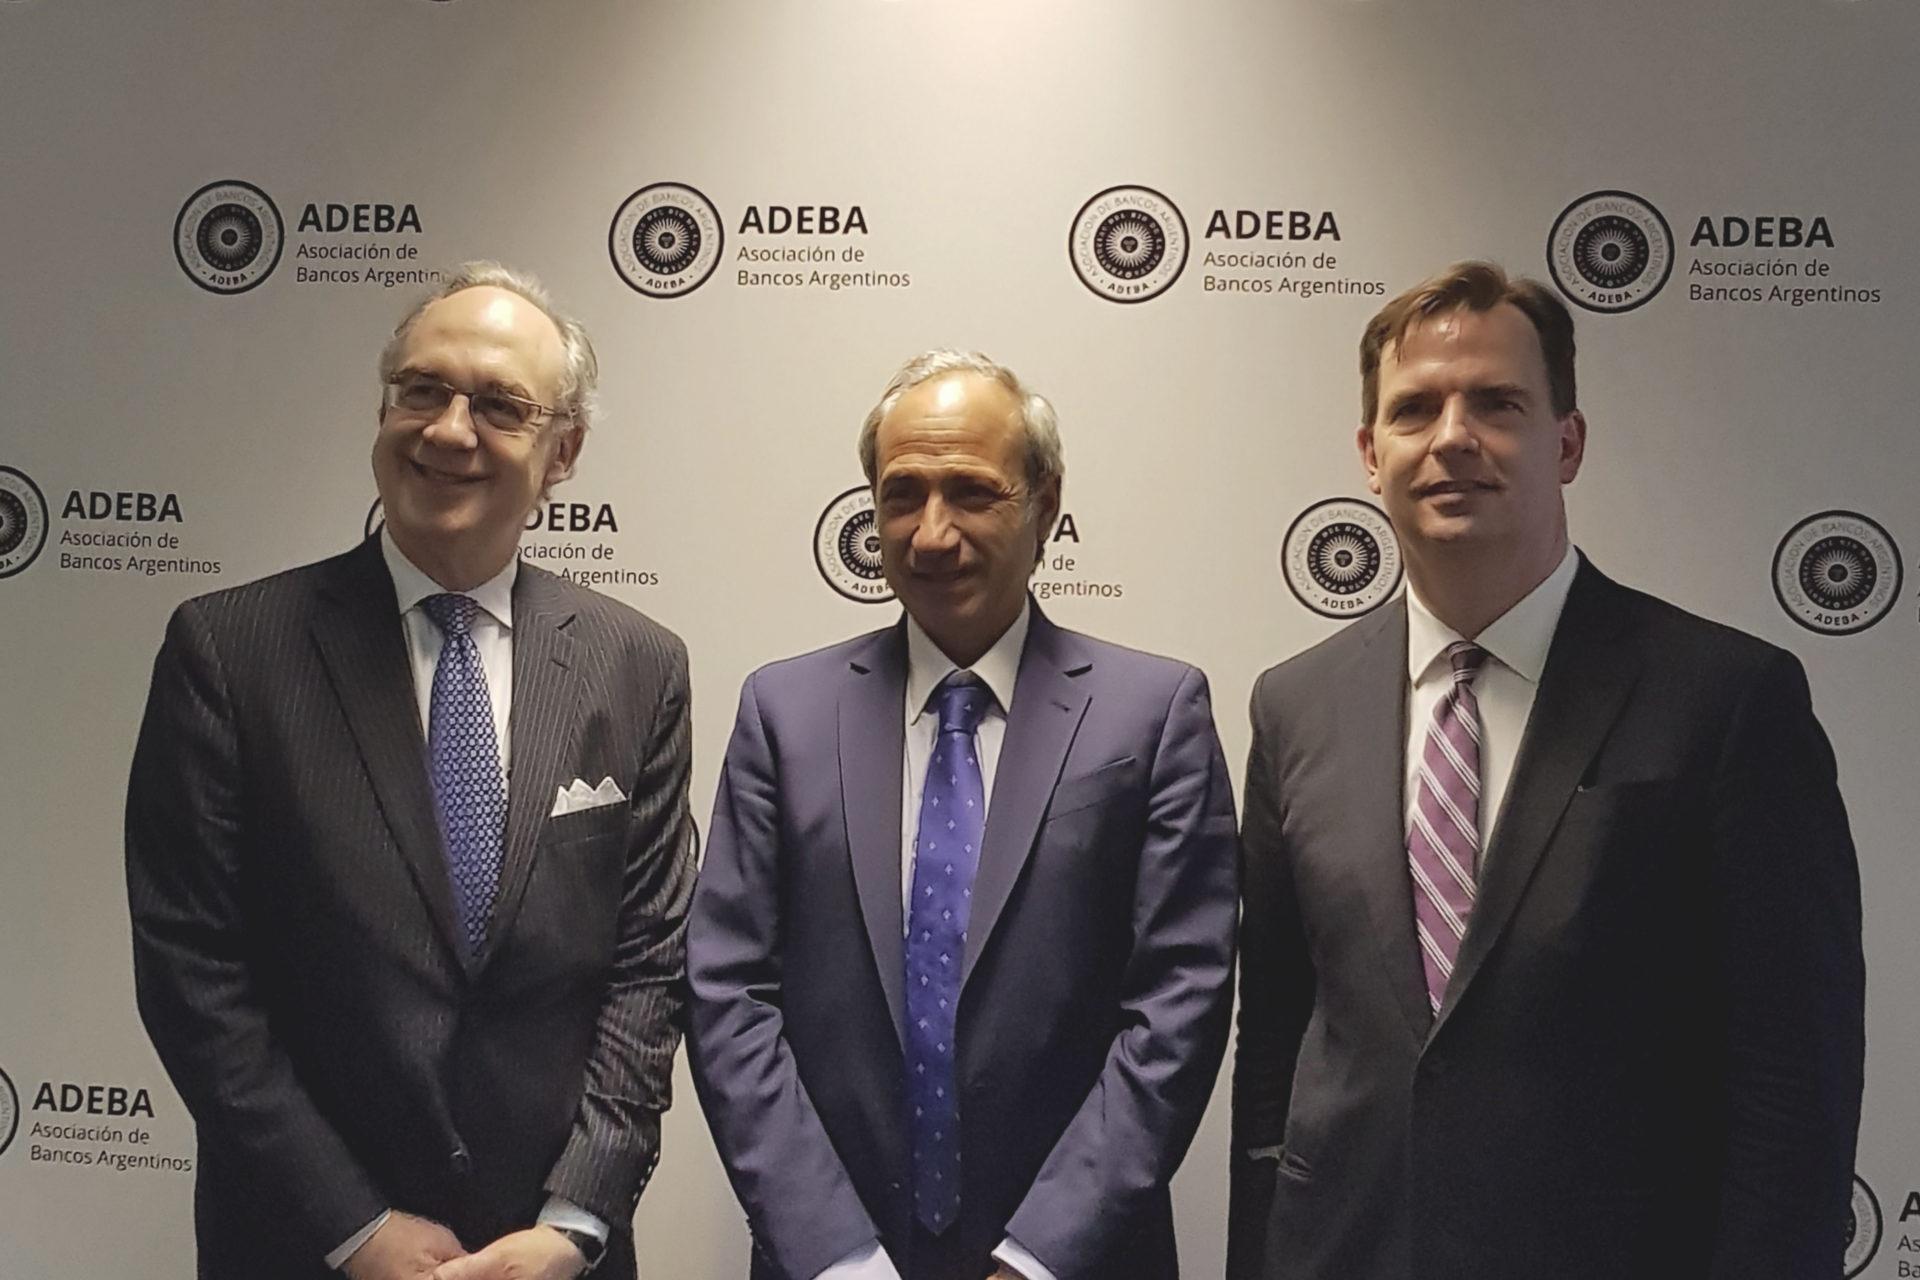 Jornada sobre mercado de capitales en ADEBA